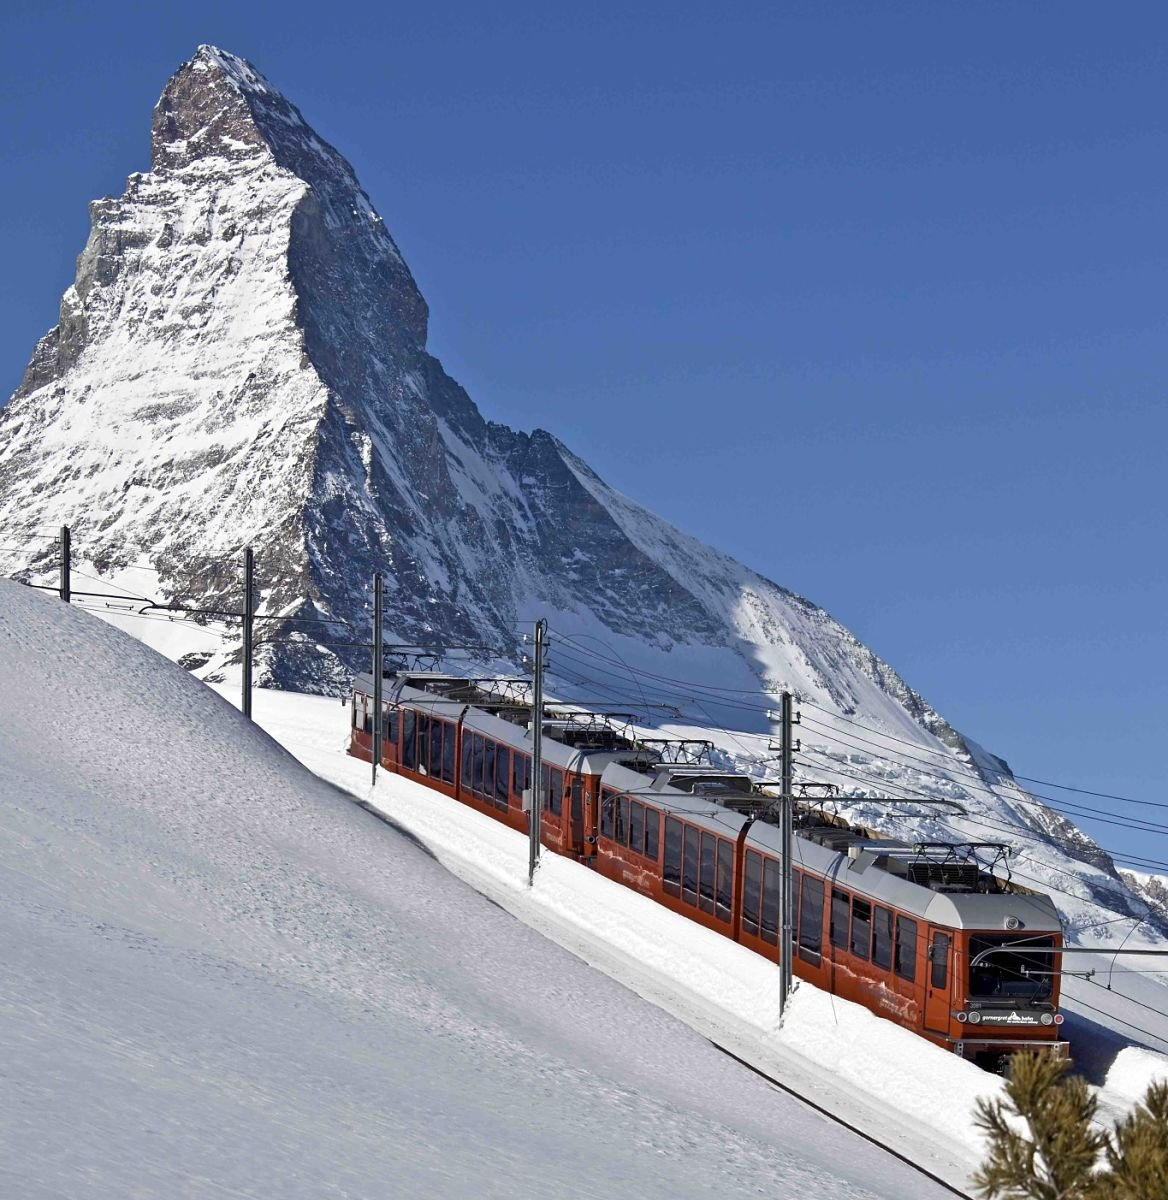 Le Gornergrat Bahn © Matterhorn Gotthard Bahn/Die Gestalten Verlag GmbH&Co. KG, 2015